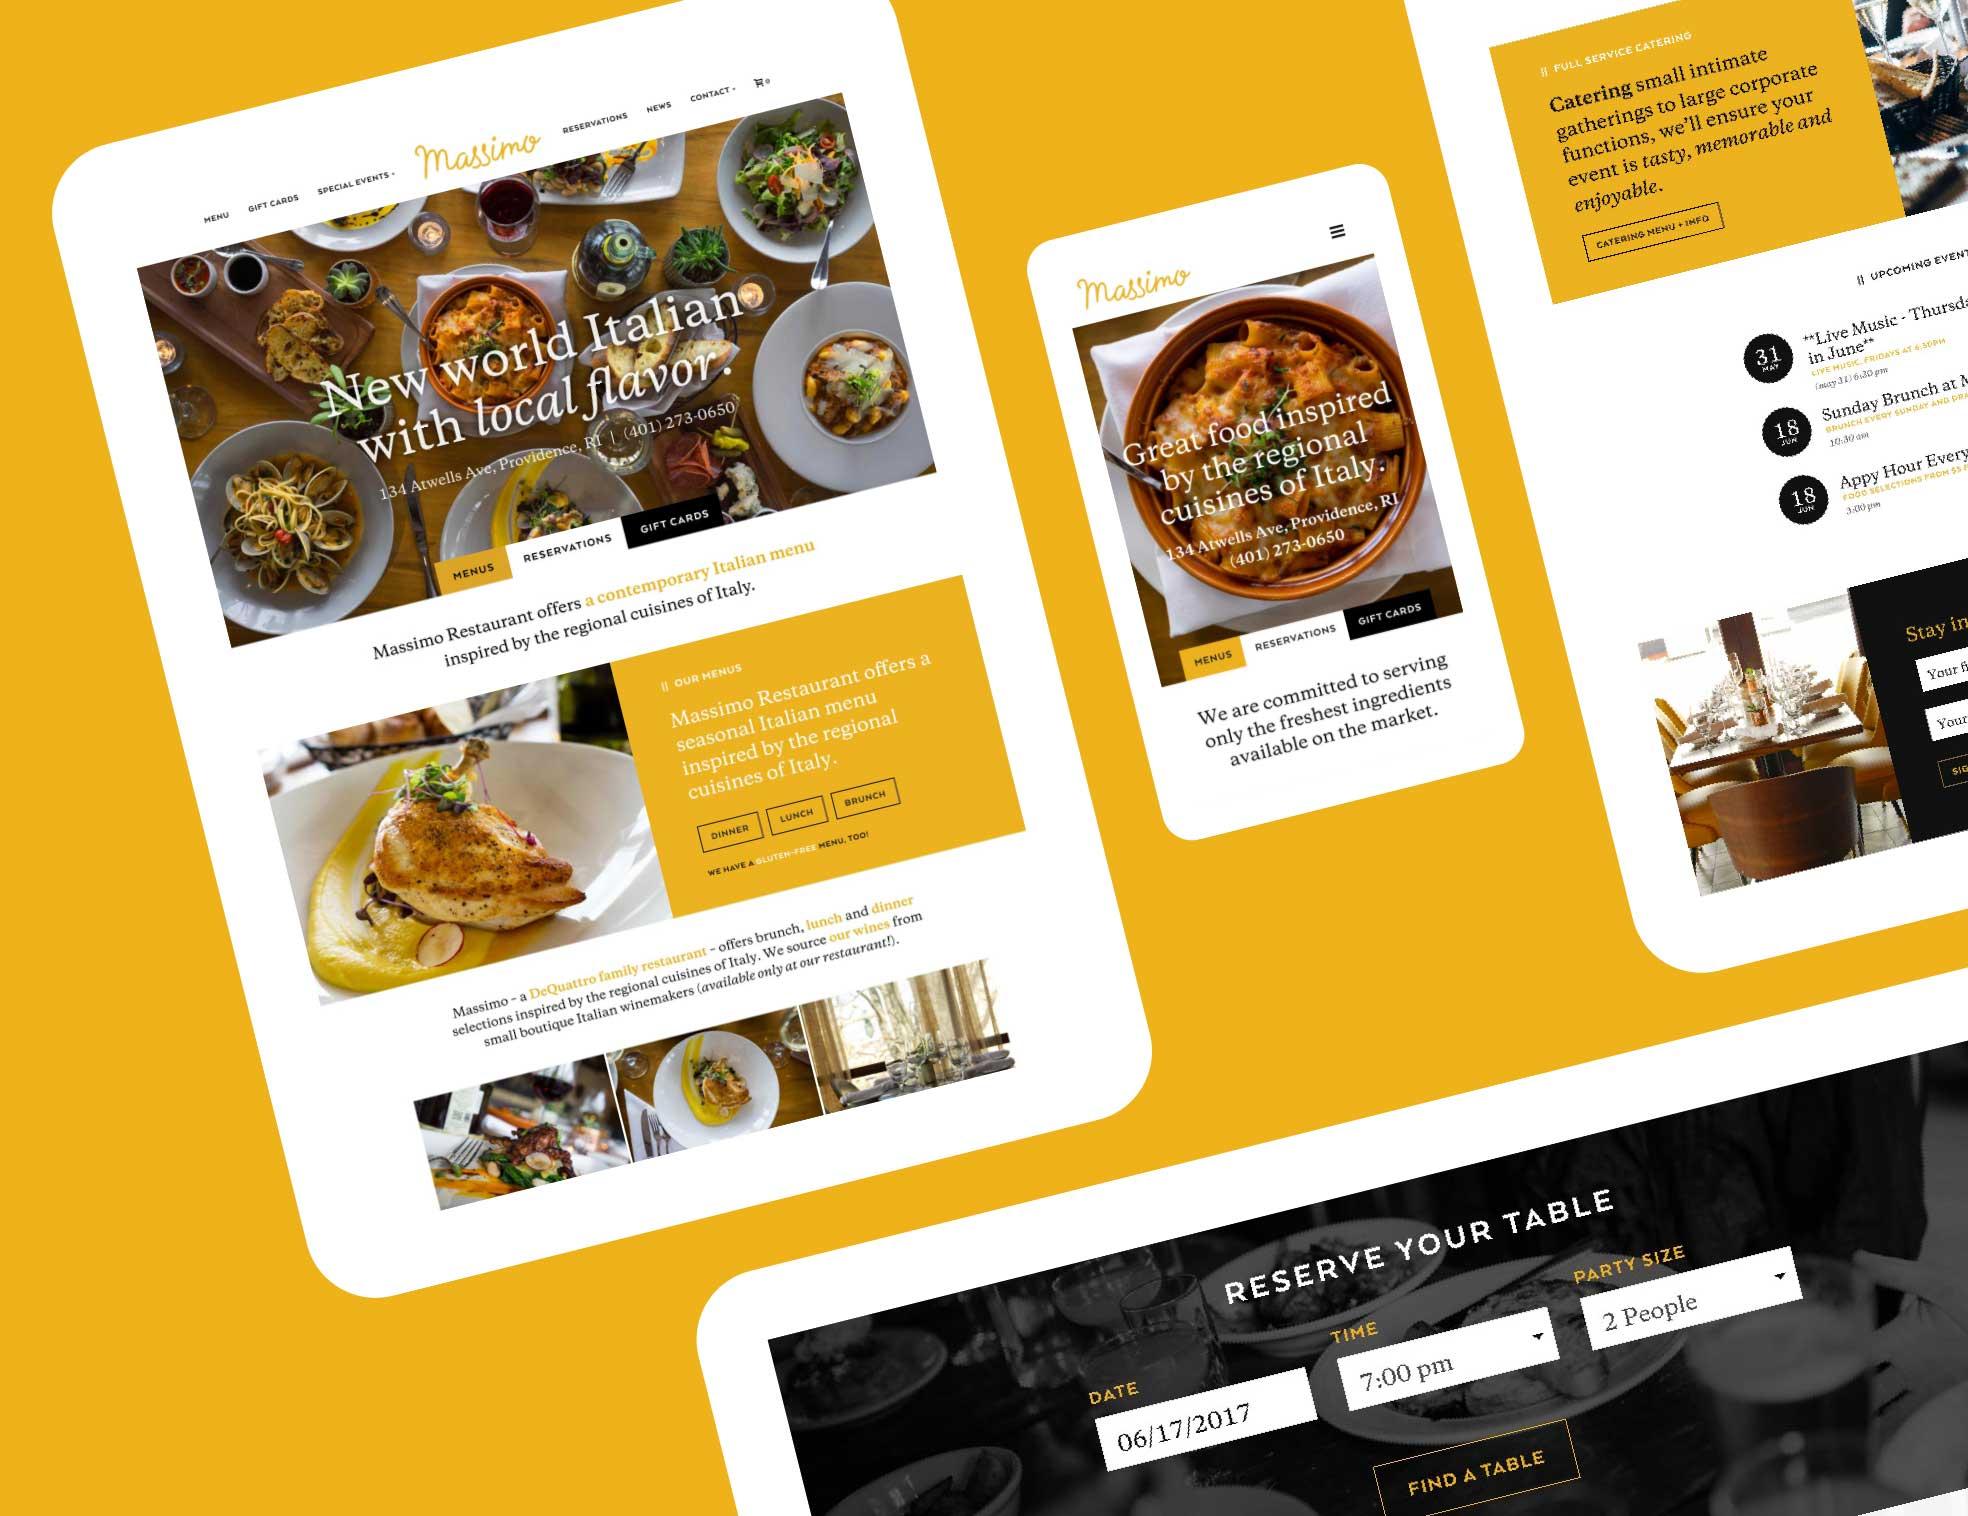 RI Italian restaurant website design and development